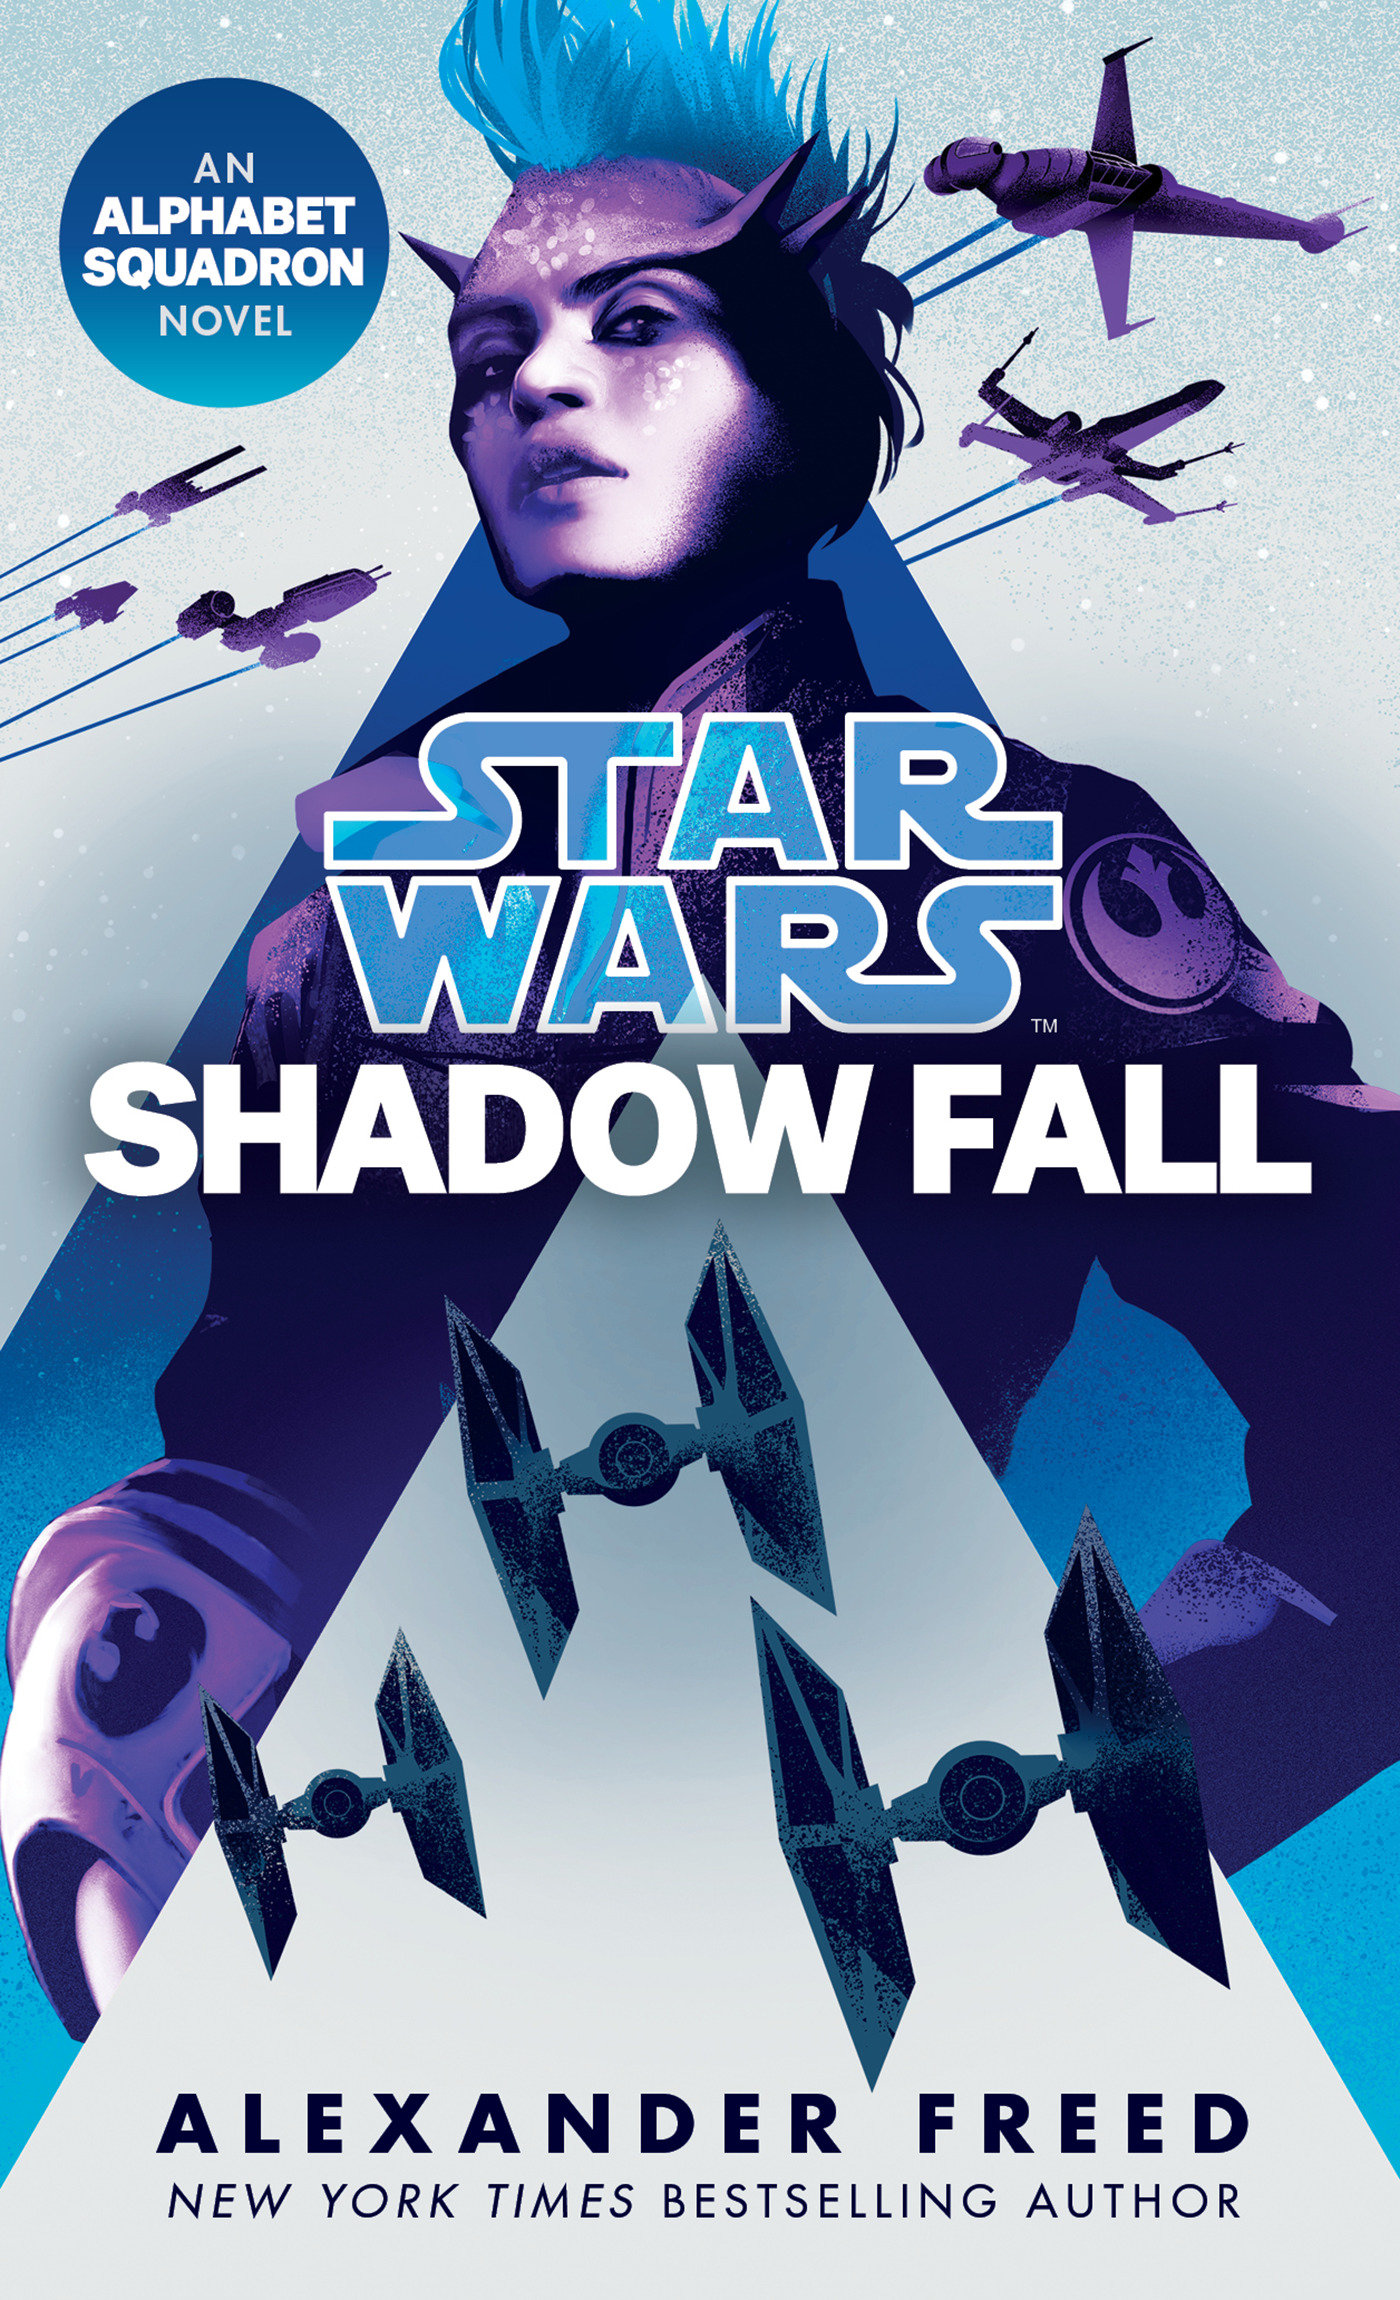 Shadow Fall: An Alphabet Squadron Novel (Export Edition) (23.02.2021)